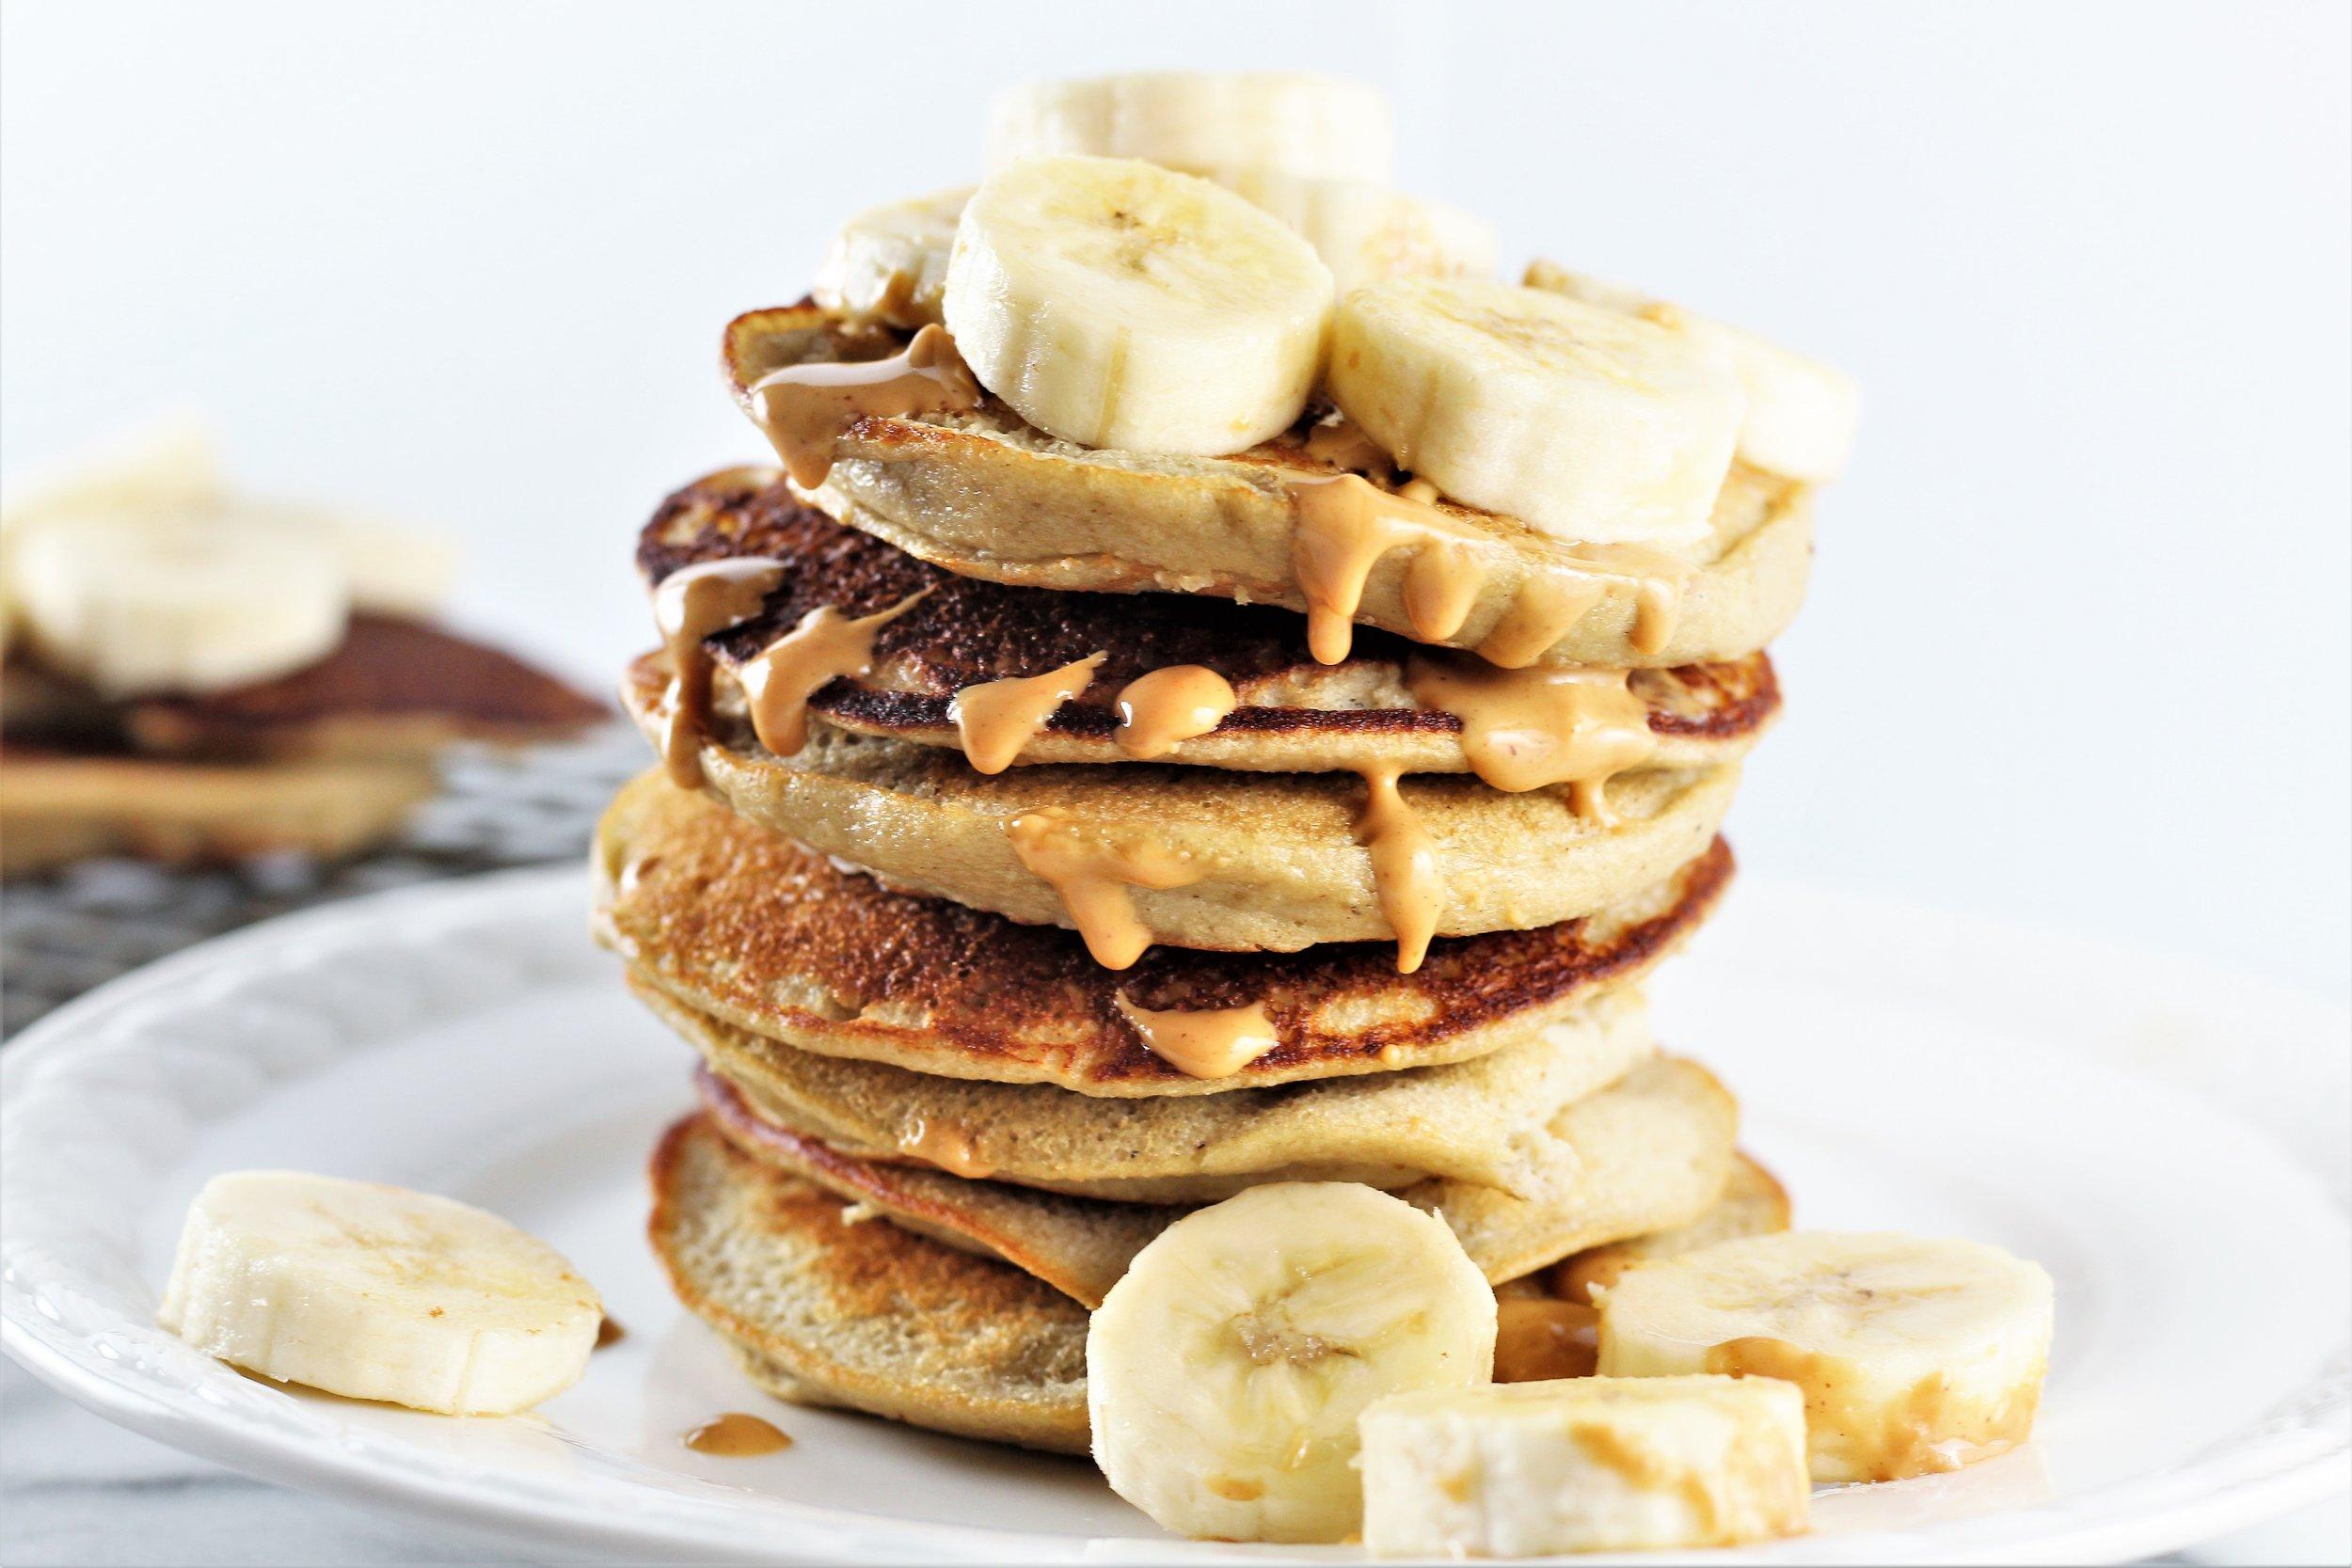 Gluten Free Banana Oat Pancakes